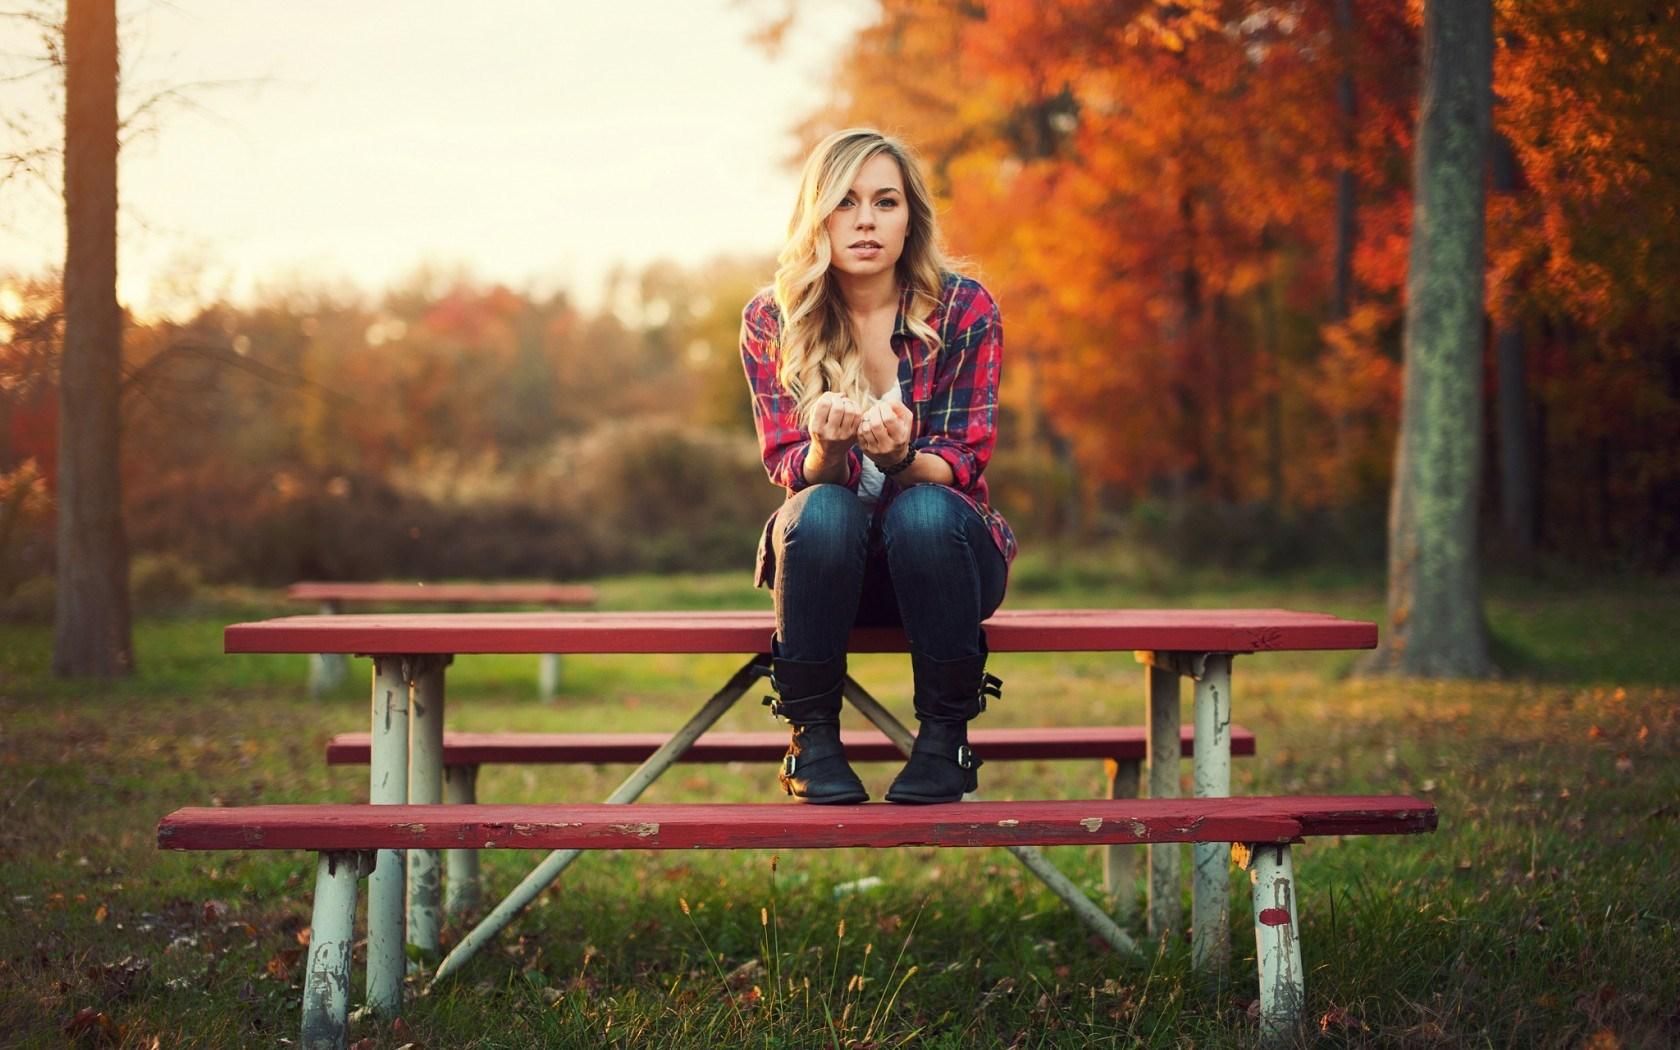 girl-autumn-mood-hd-wallpaper